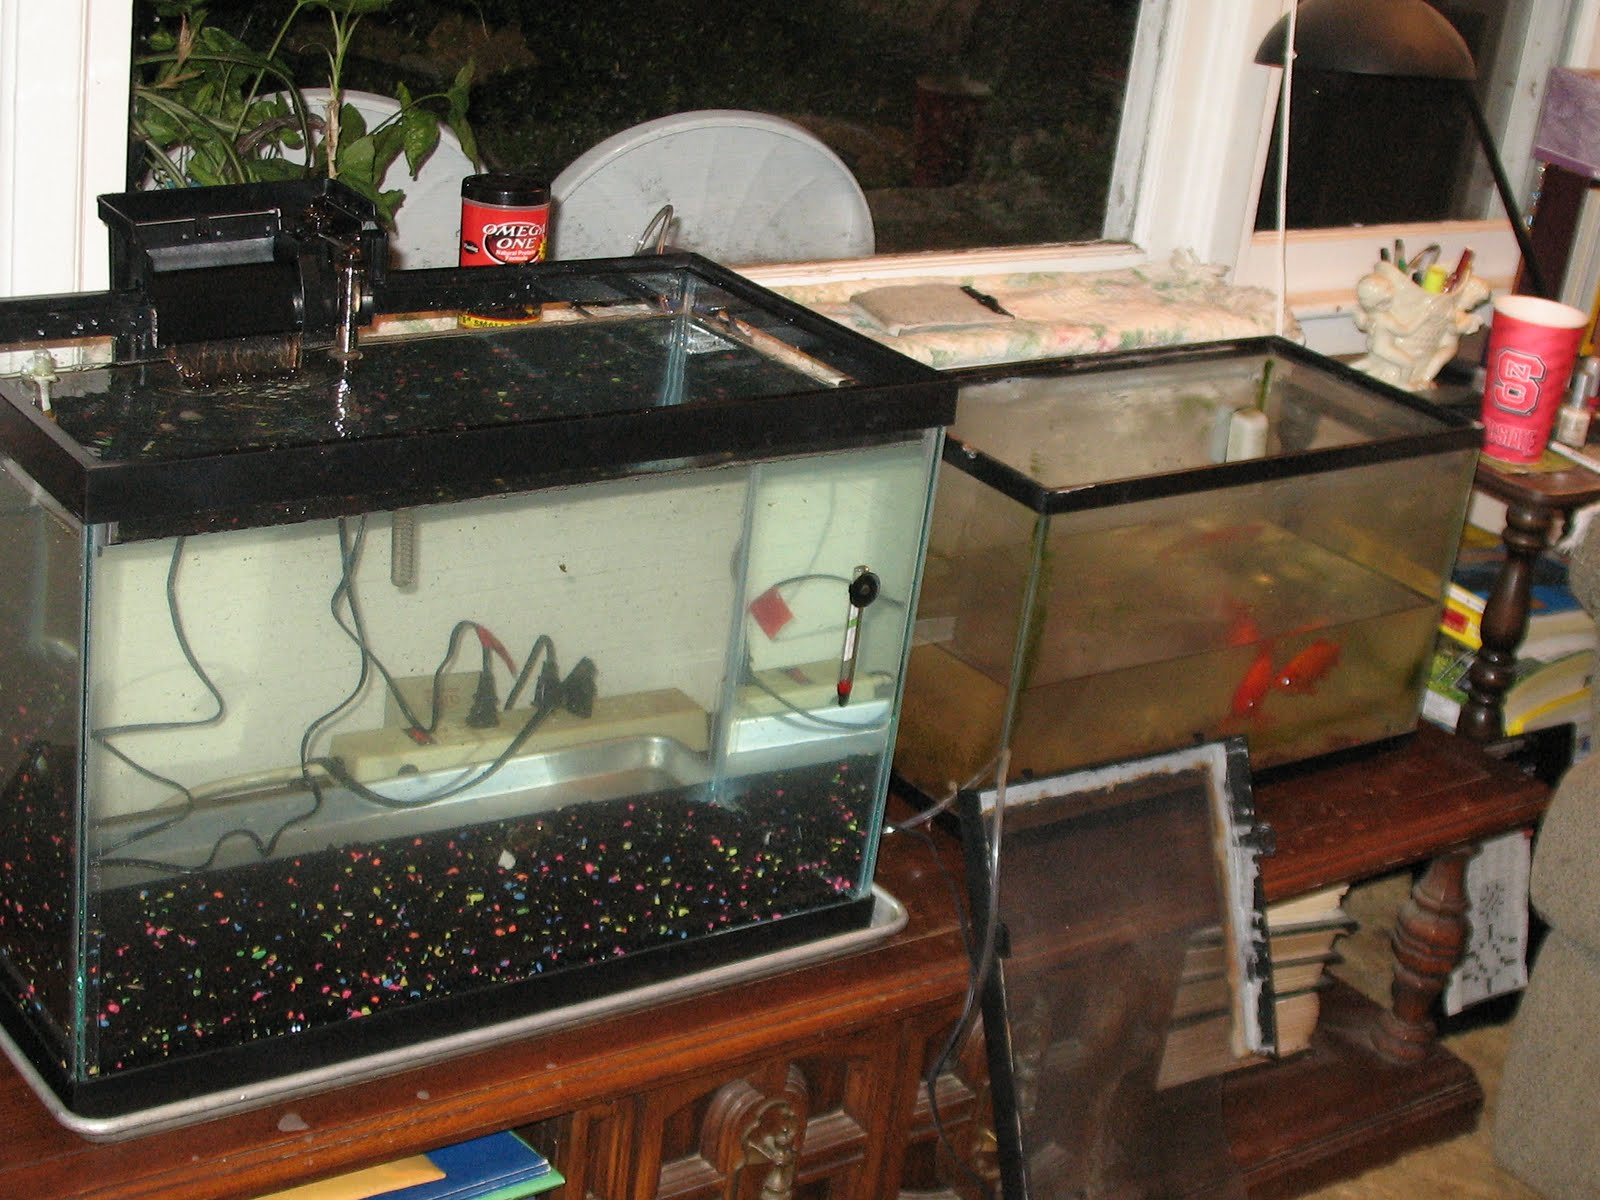 10 20 gallon fish tank hall of flowers 20 gallon fish for 20 gallon fish tank petsmart